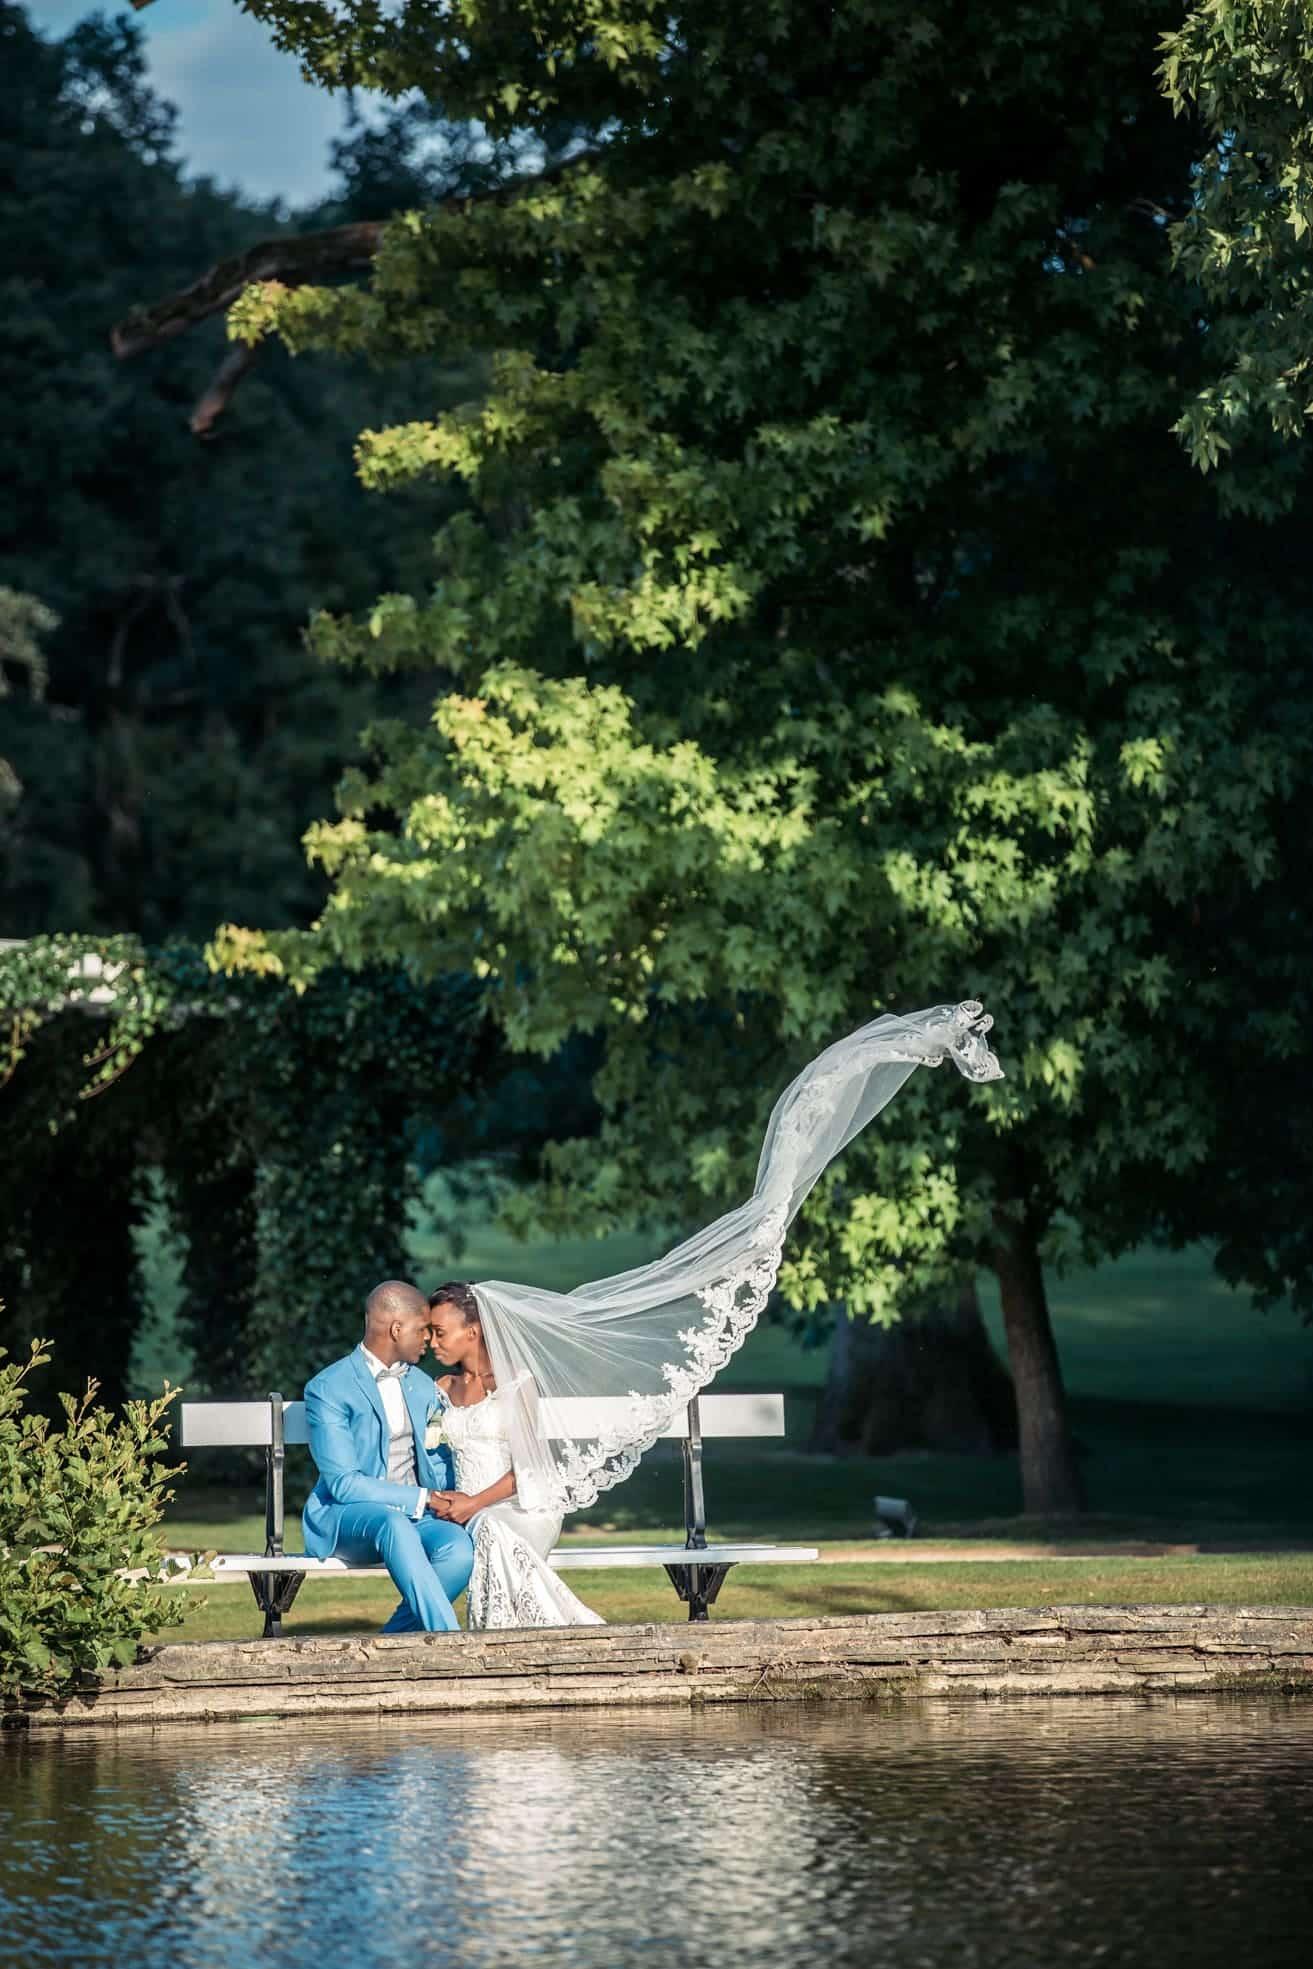 wedding photographer france, paris engagement photographer, paris wedding photoshoot, photoshoot Paris, professional photographer Paris french wedding photographer, jean-Baptiste Chauvin, www.studioart-photographe.fr